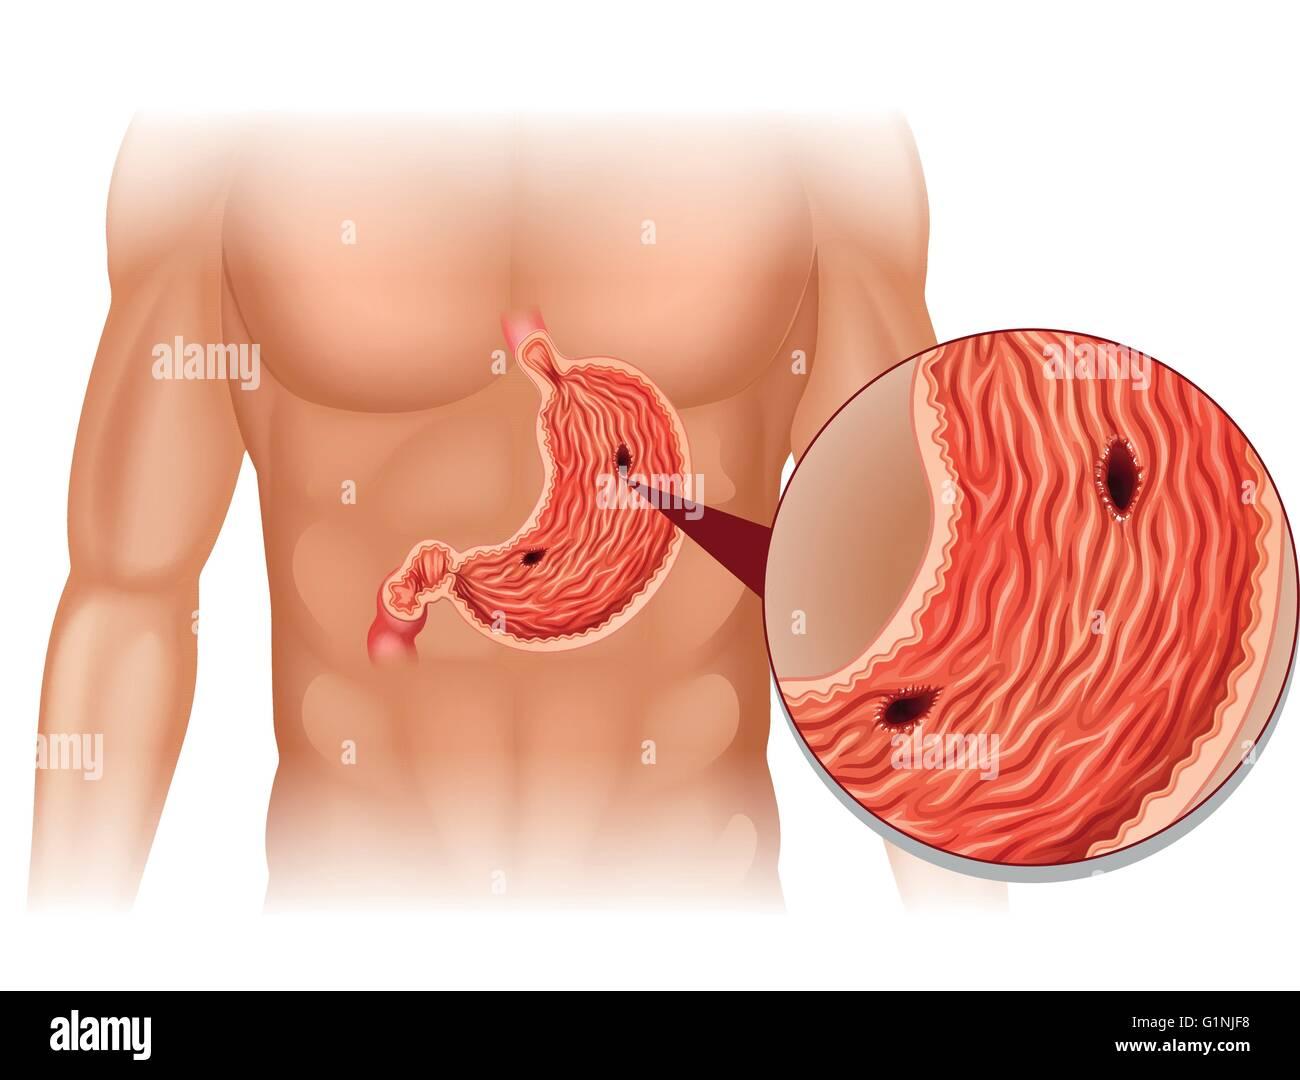 stomach ulcer in human body illustration G1NJF8 stomach ulcer in human body illustration stock vector art